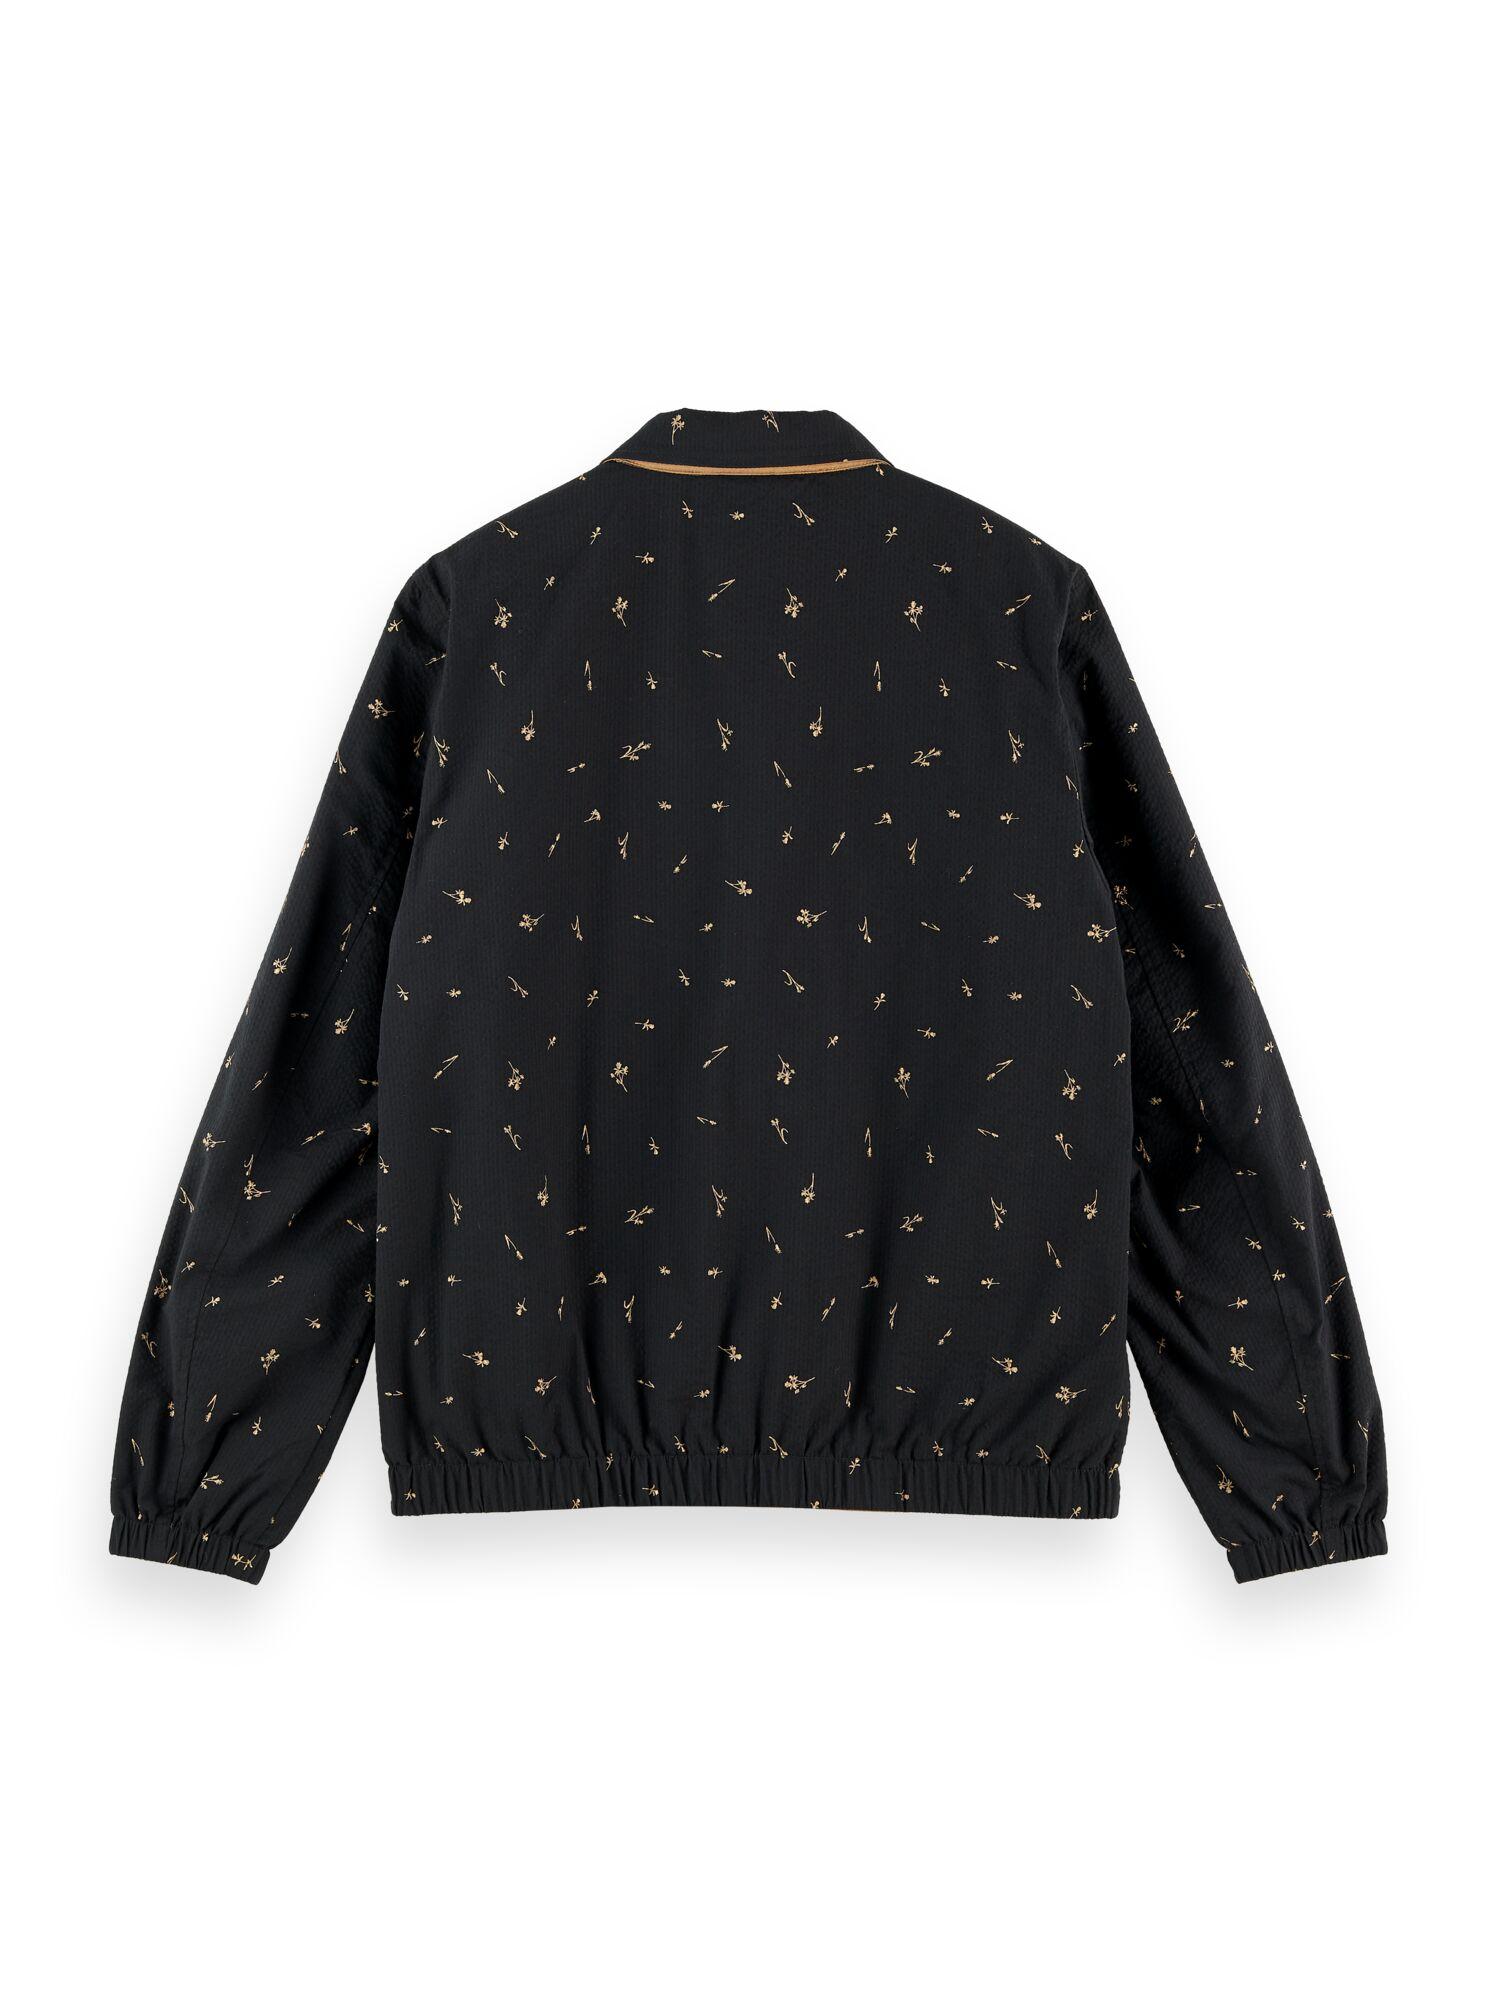 Scotch & Soda | reversible shirt jacket